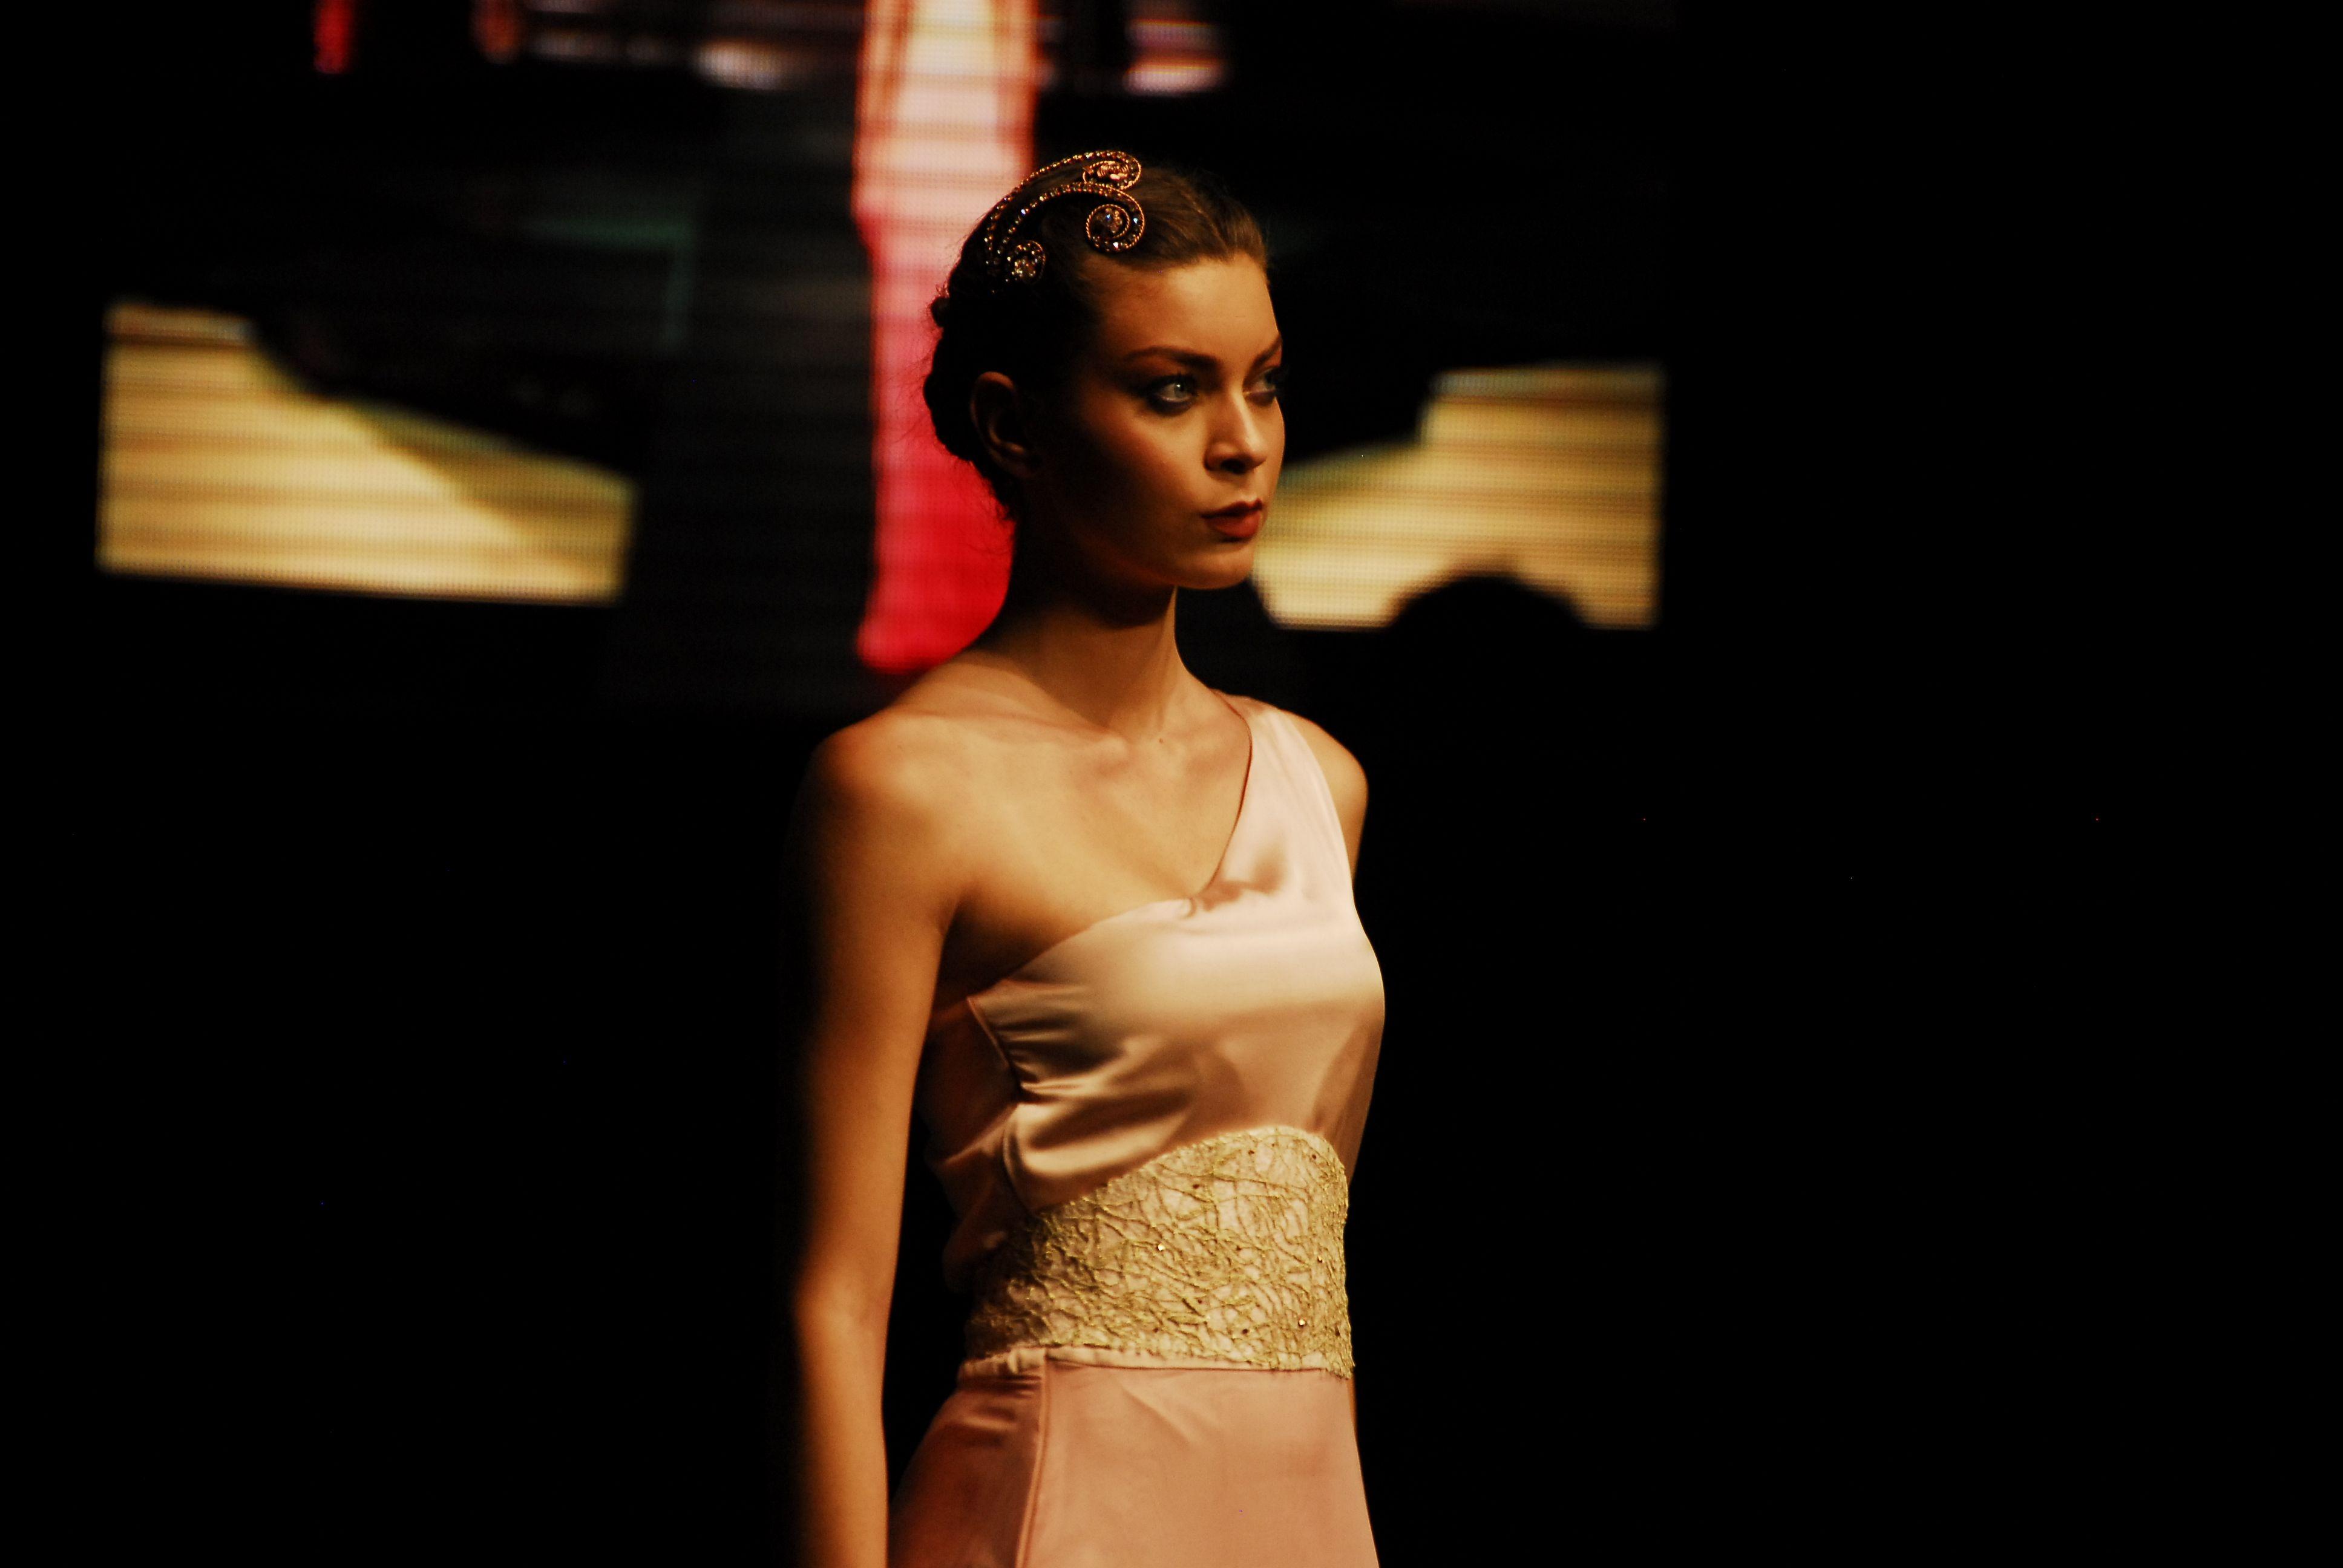 İzmir University of Economics Graduation Fashion Show - Begüm Acar